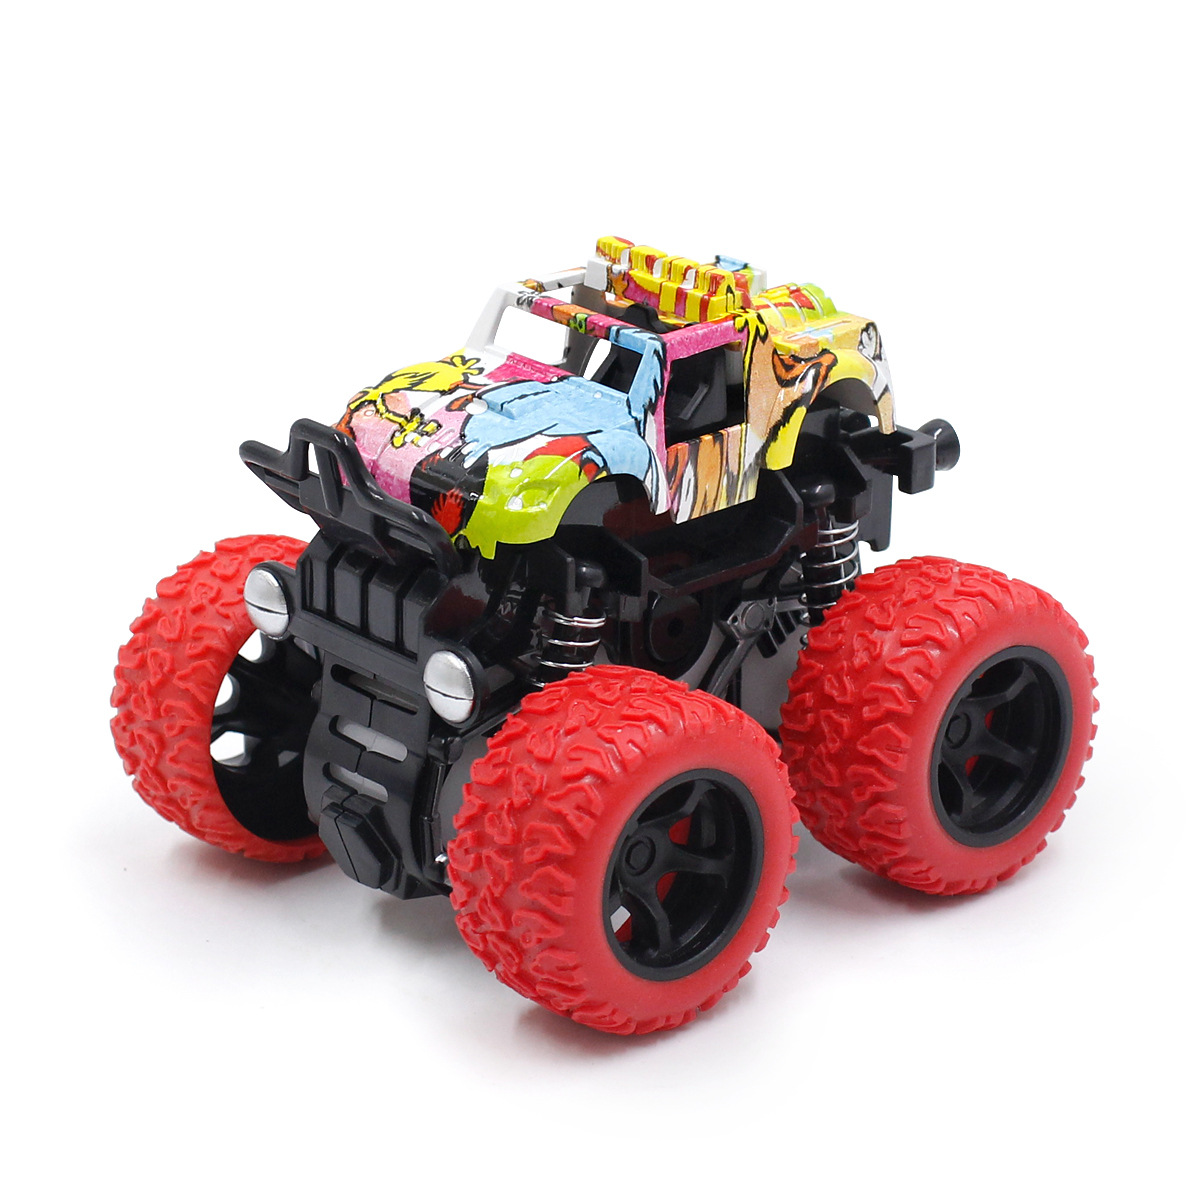 Babe Duck CHILDREN'S Toy Car Cartoon Graffiti 4-Wheel Drive Double Inertia Monster Truck Spring Shock Absorption 360-Degree Flip